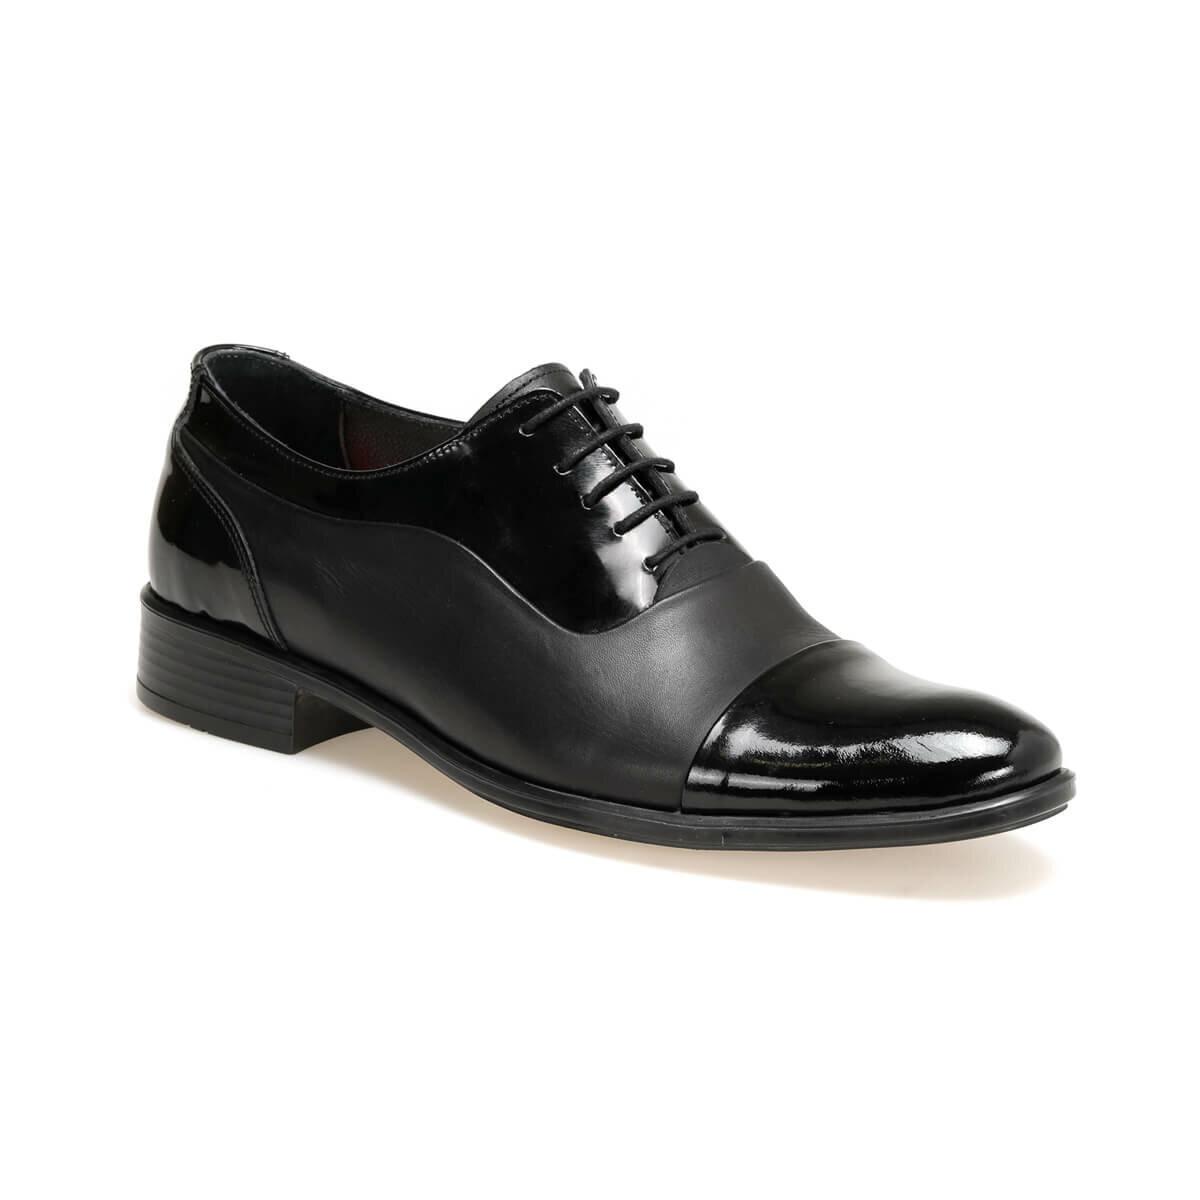 FLO 409 Black Men 'S Classic Shoes Garamond